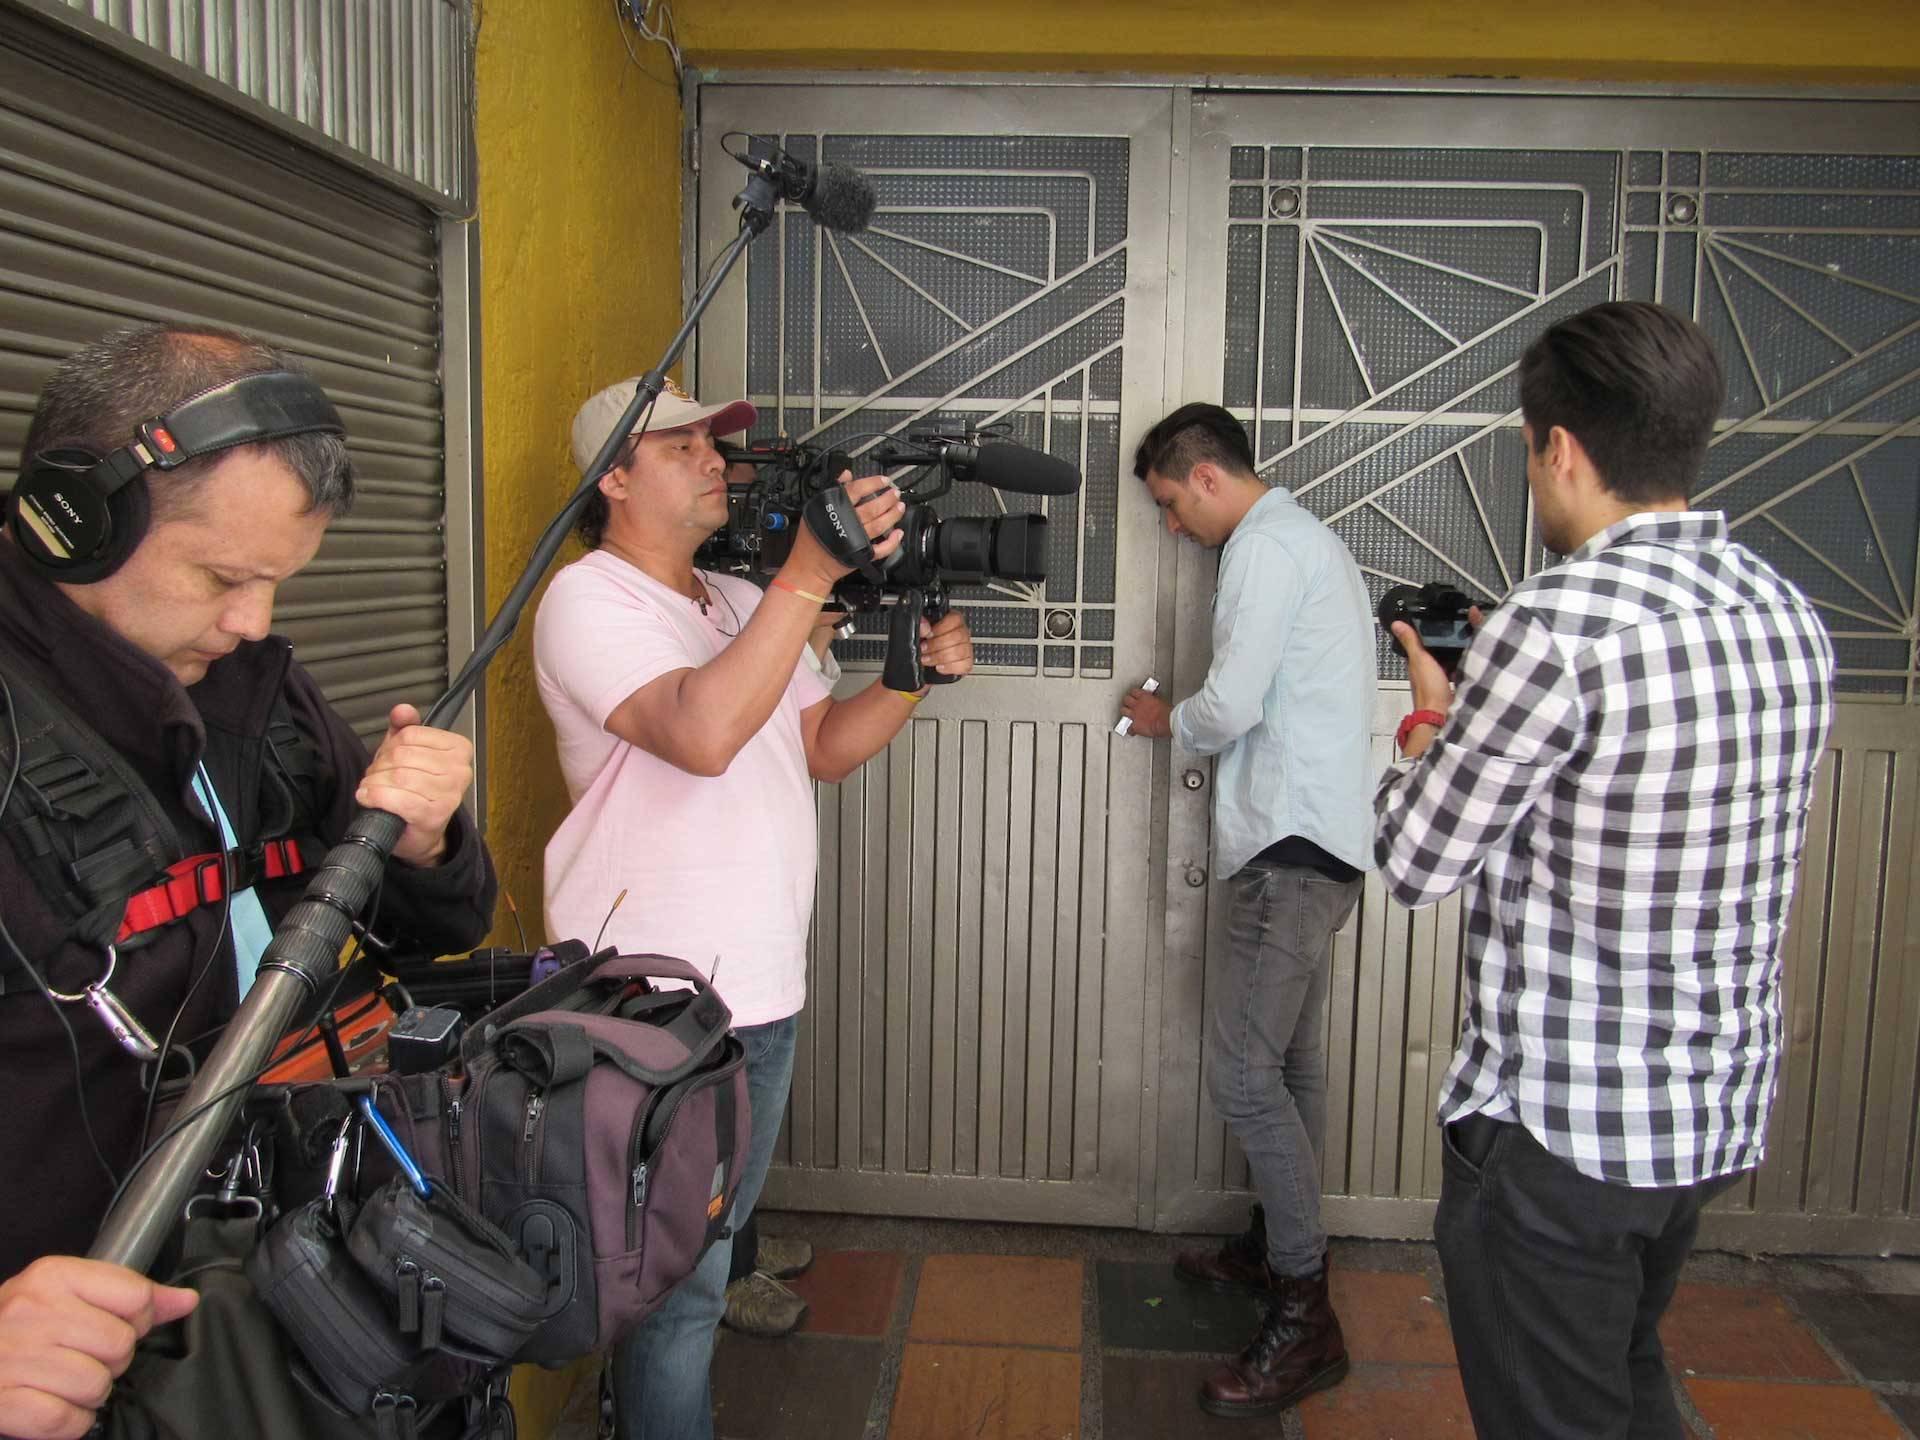 mgid:file:gsp:scenic:/international/mtvla.com/catfish-colombia/temporada-2/fotogalerias/episodio-206/CATFISHCO_BTS_206_9.jpg